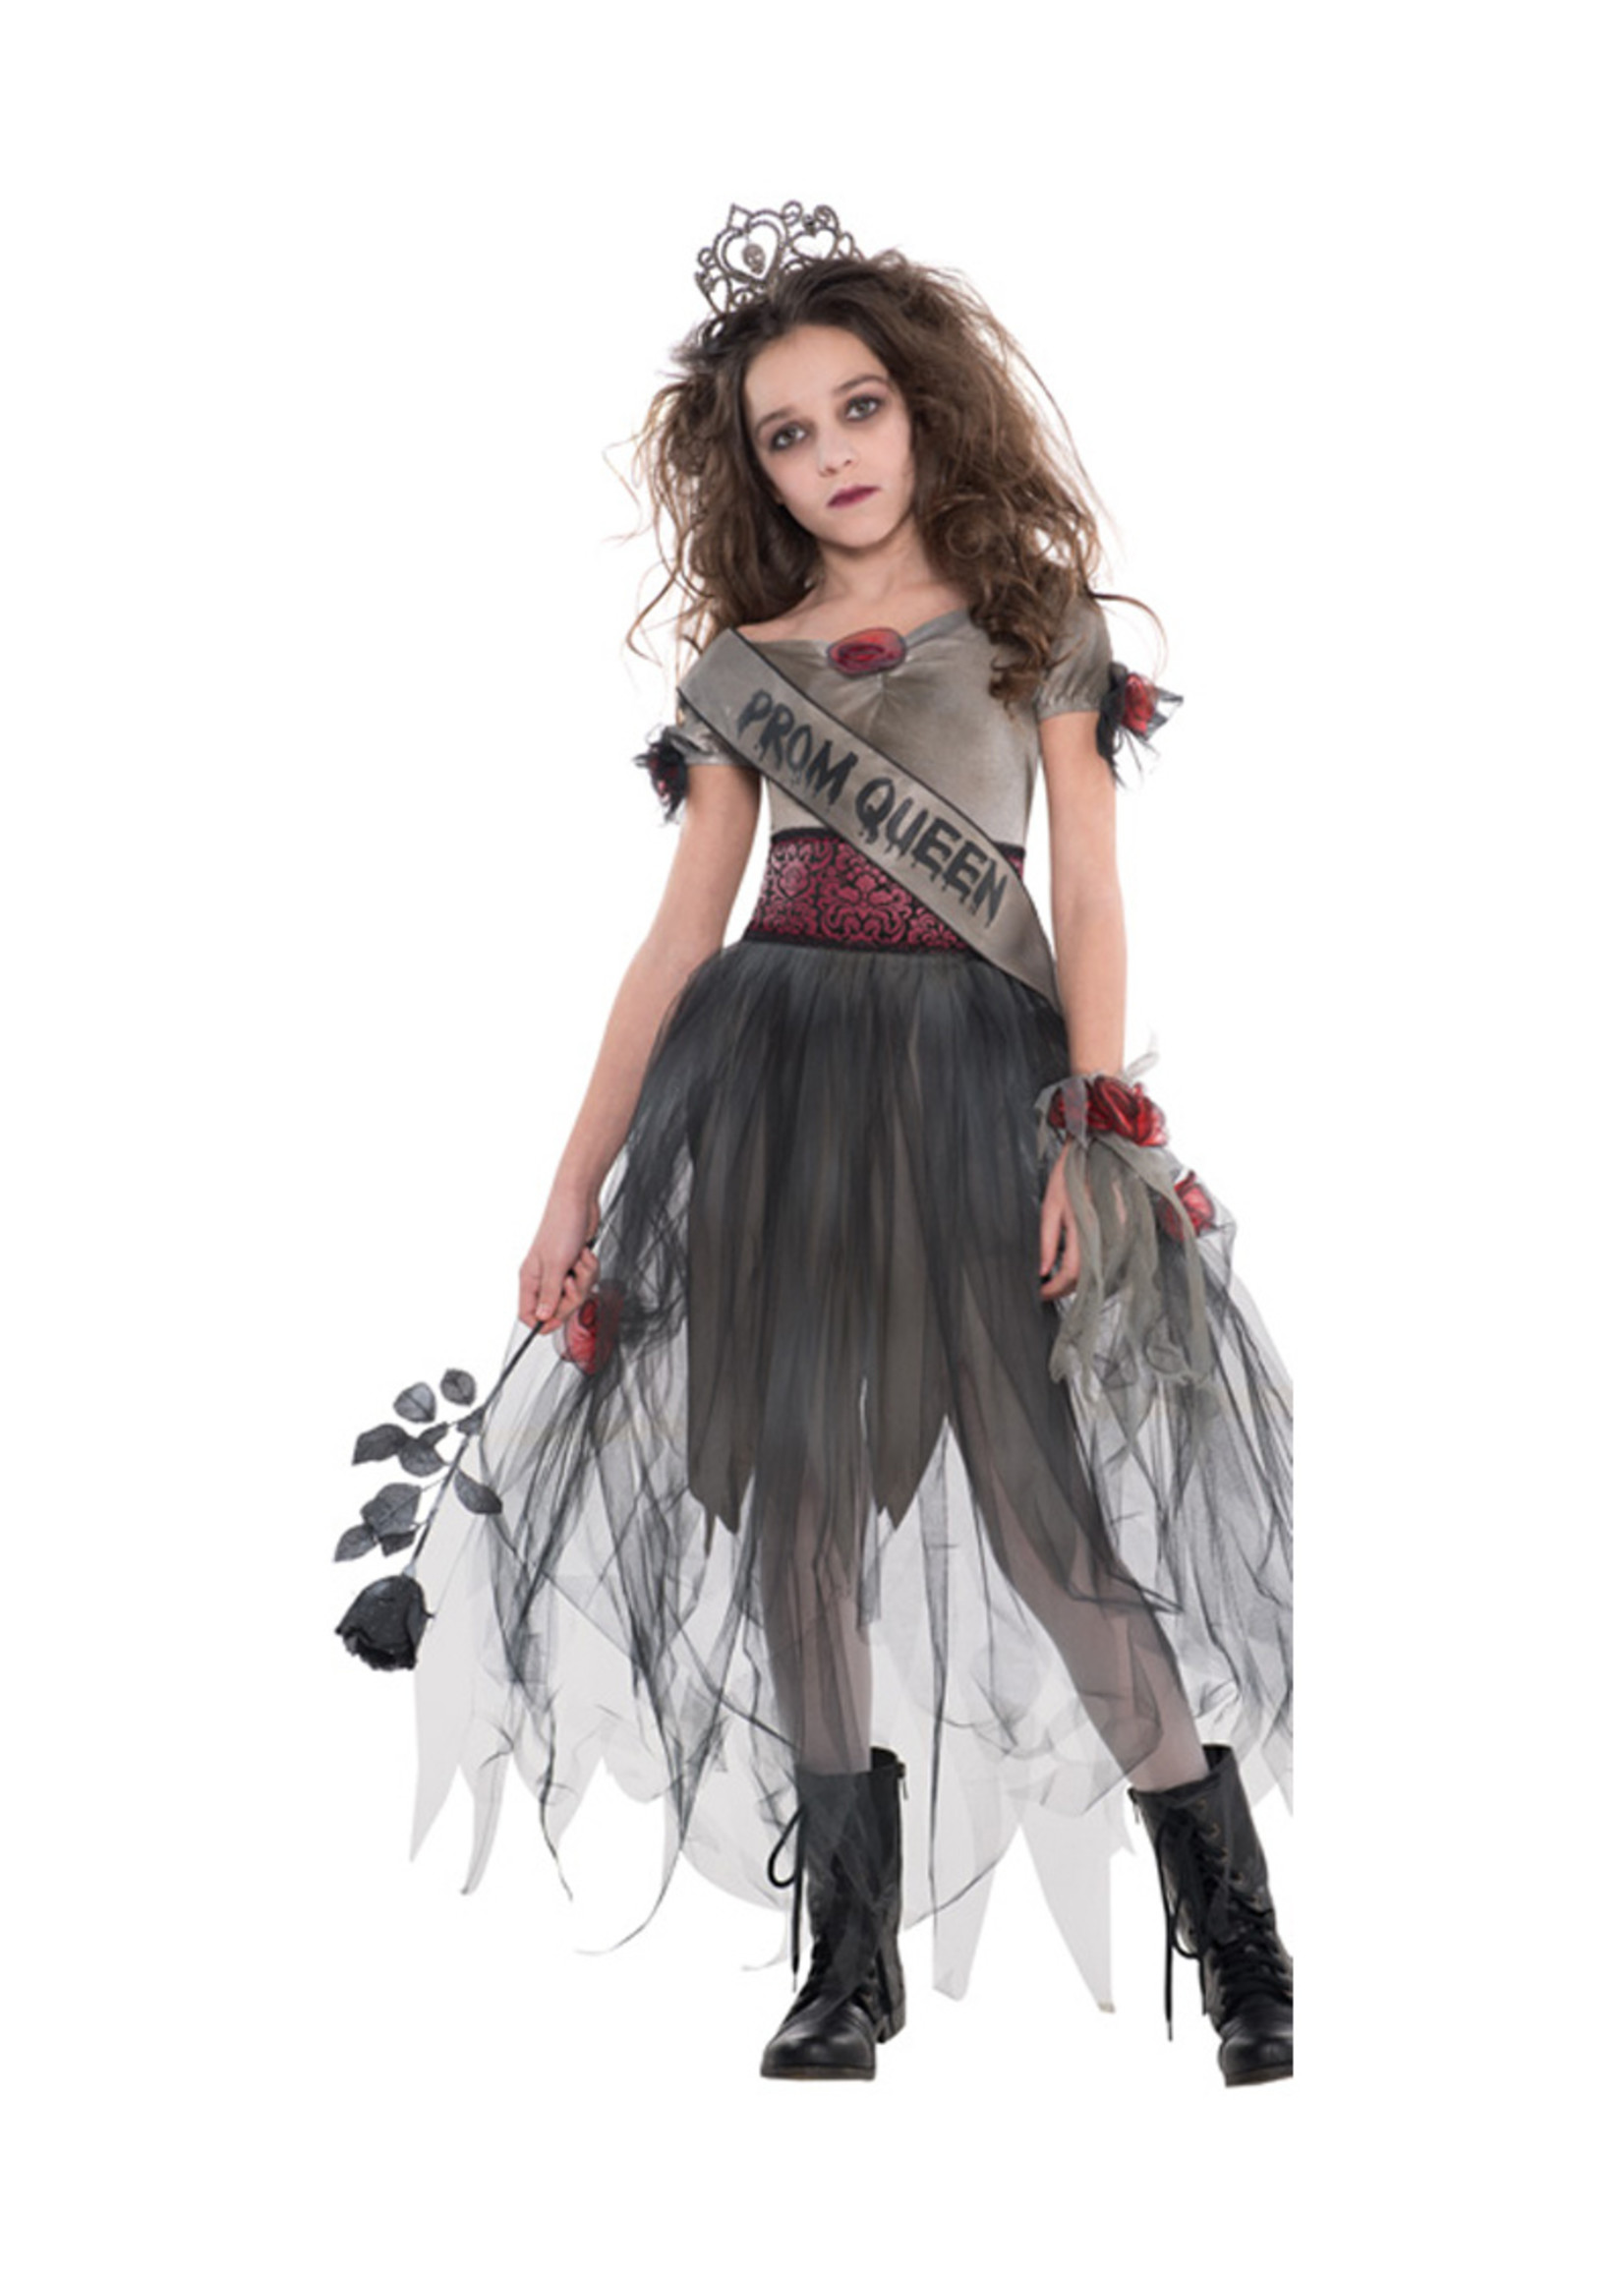 Prom Corpse Costume - Girls